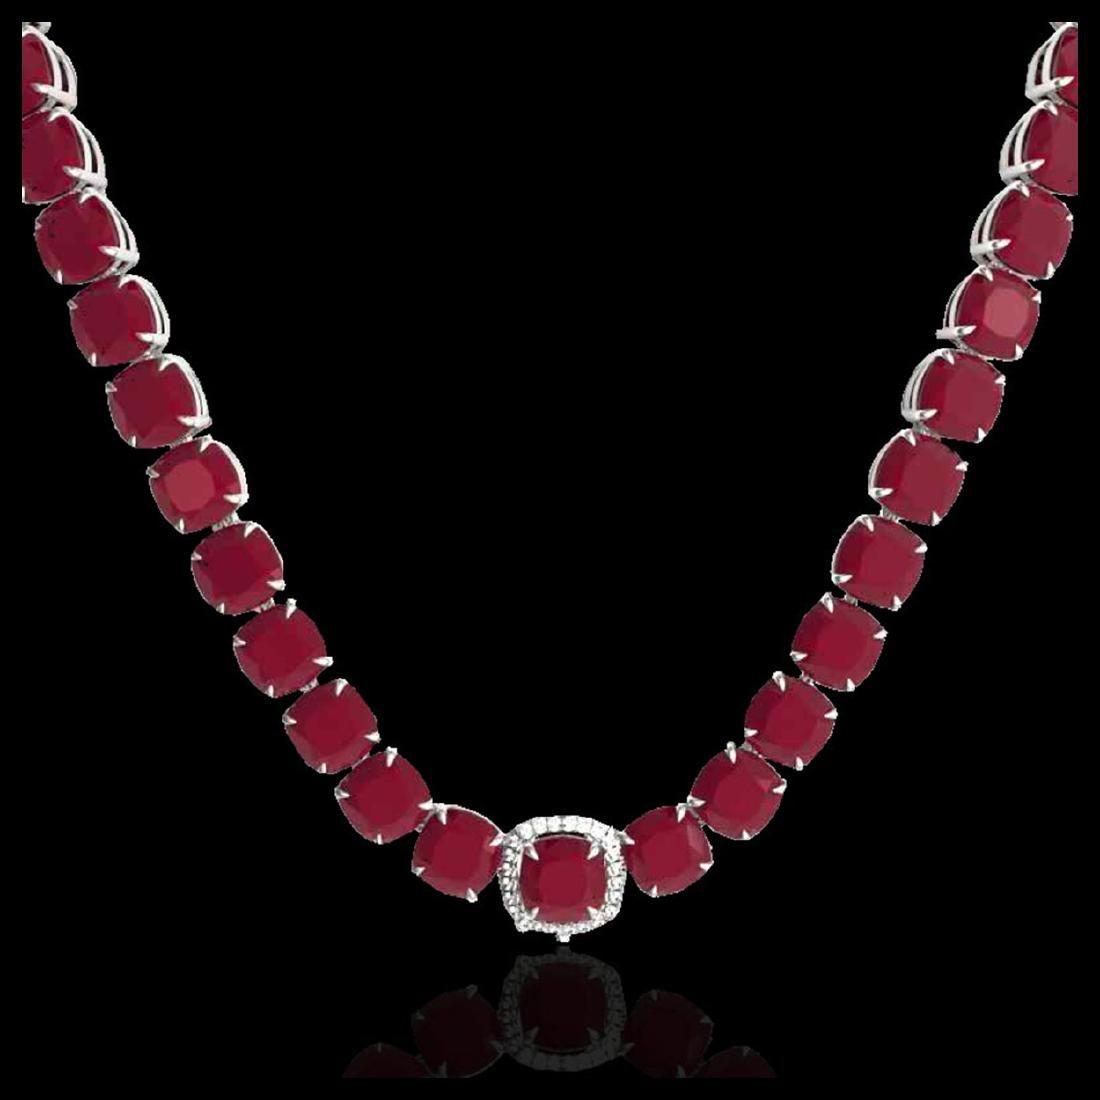 116 ctw Ruby & Diamond Eternity Necklace 14K White Gold - 2